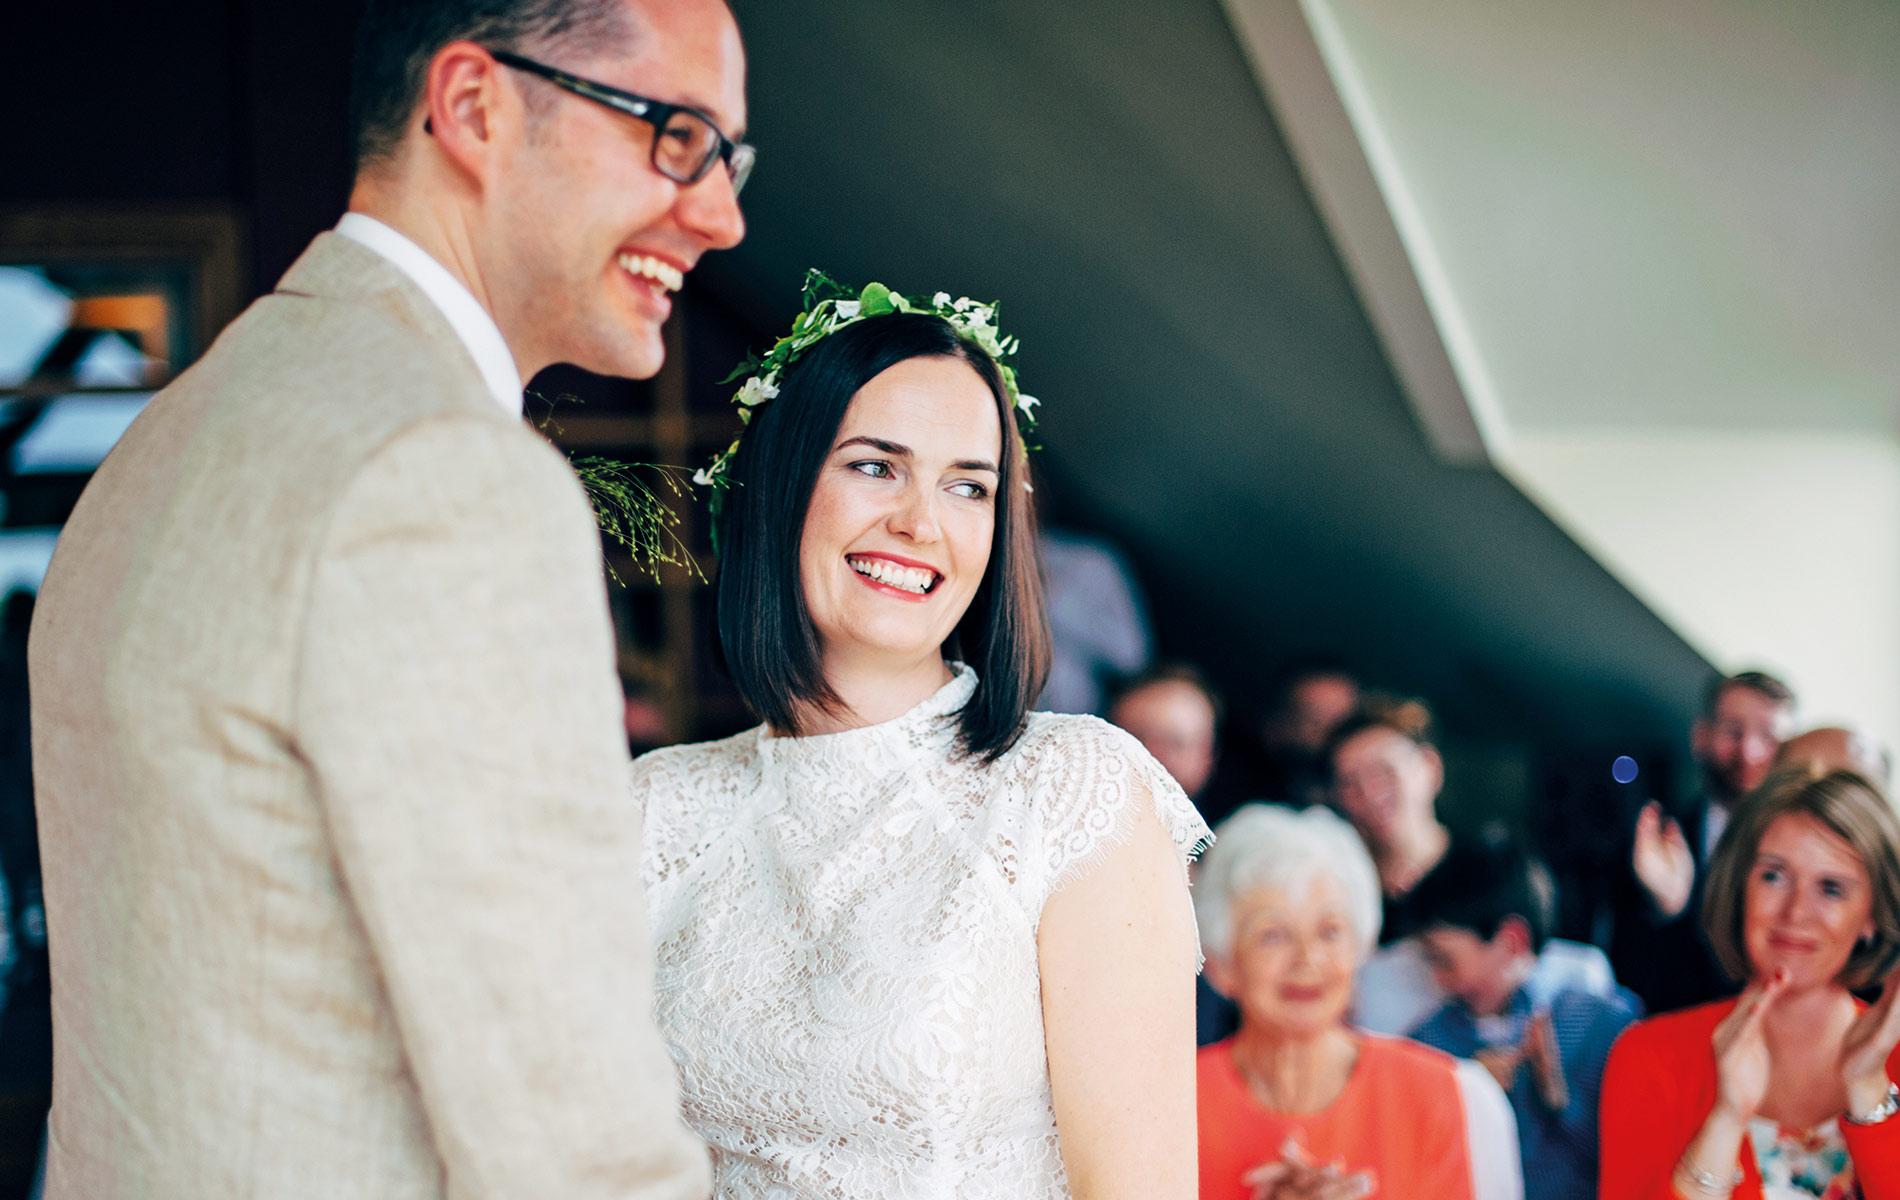 Neasa Cooke and John French Wedding, Inishbofin House Hotel. Photo by Darek Novak